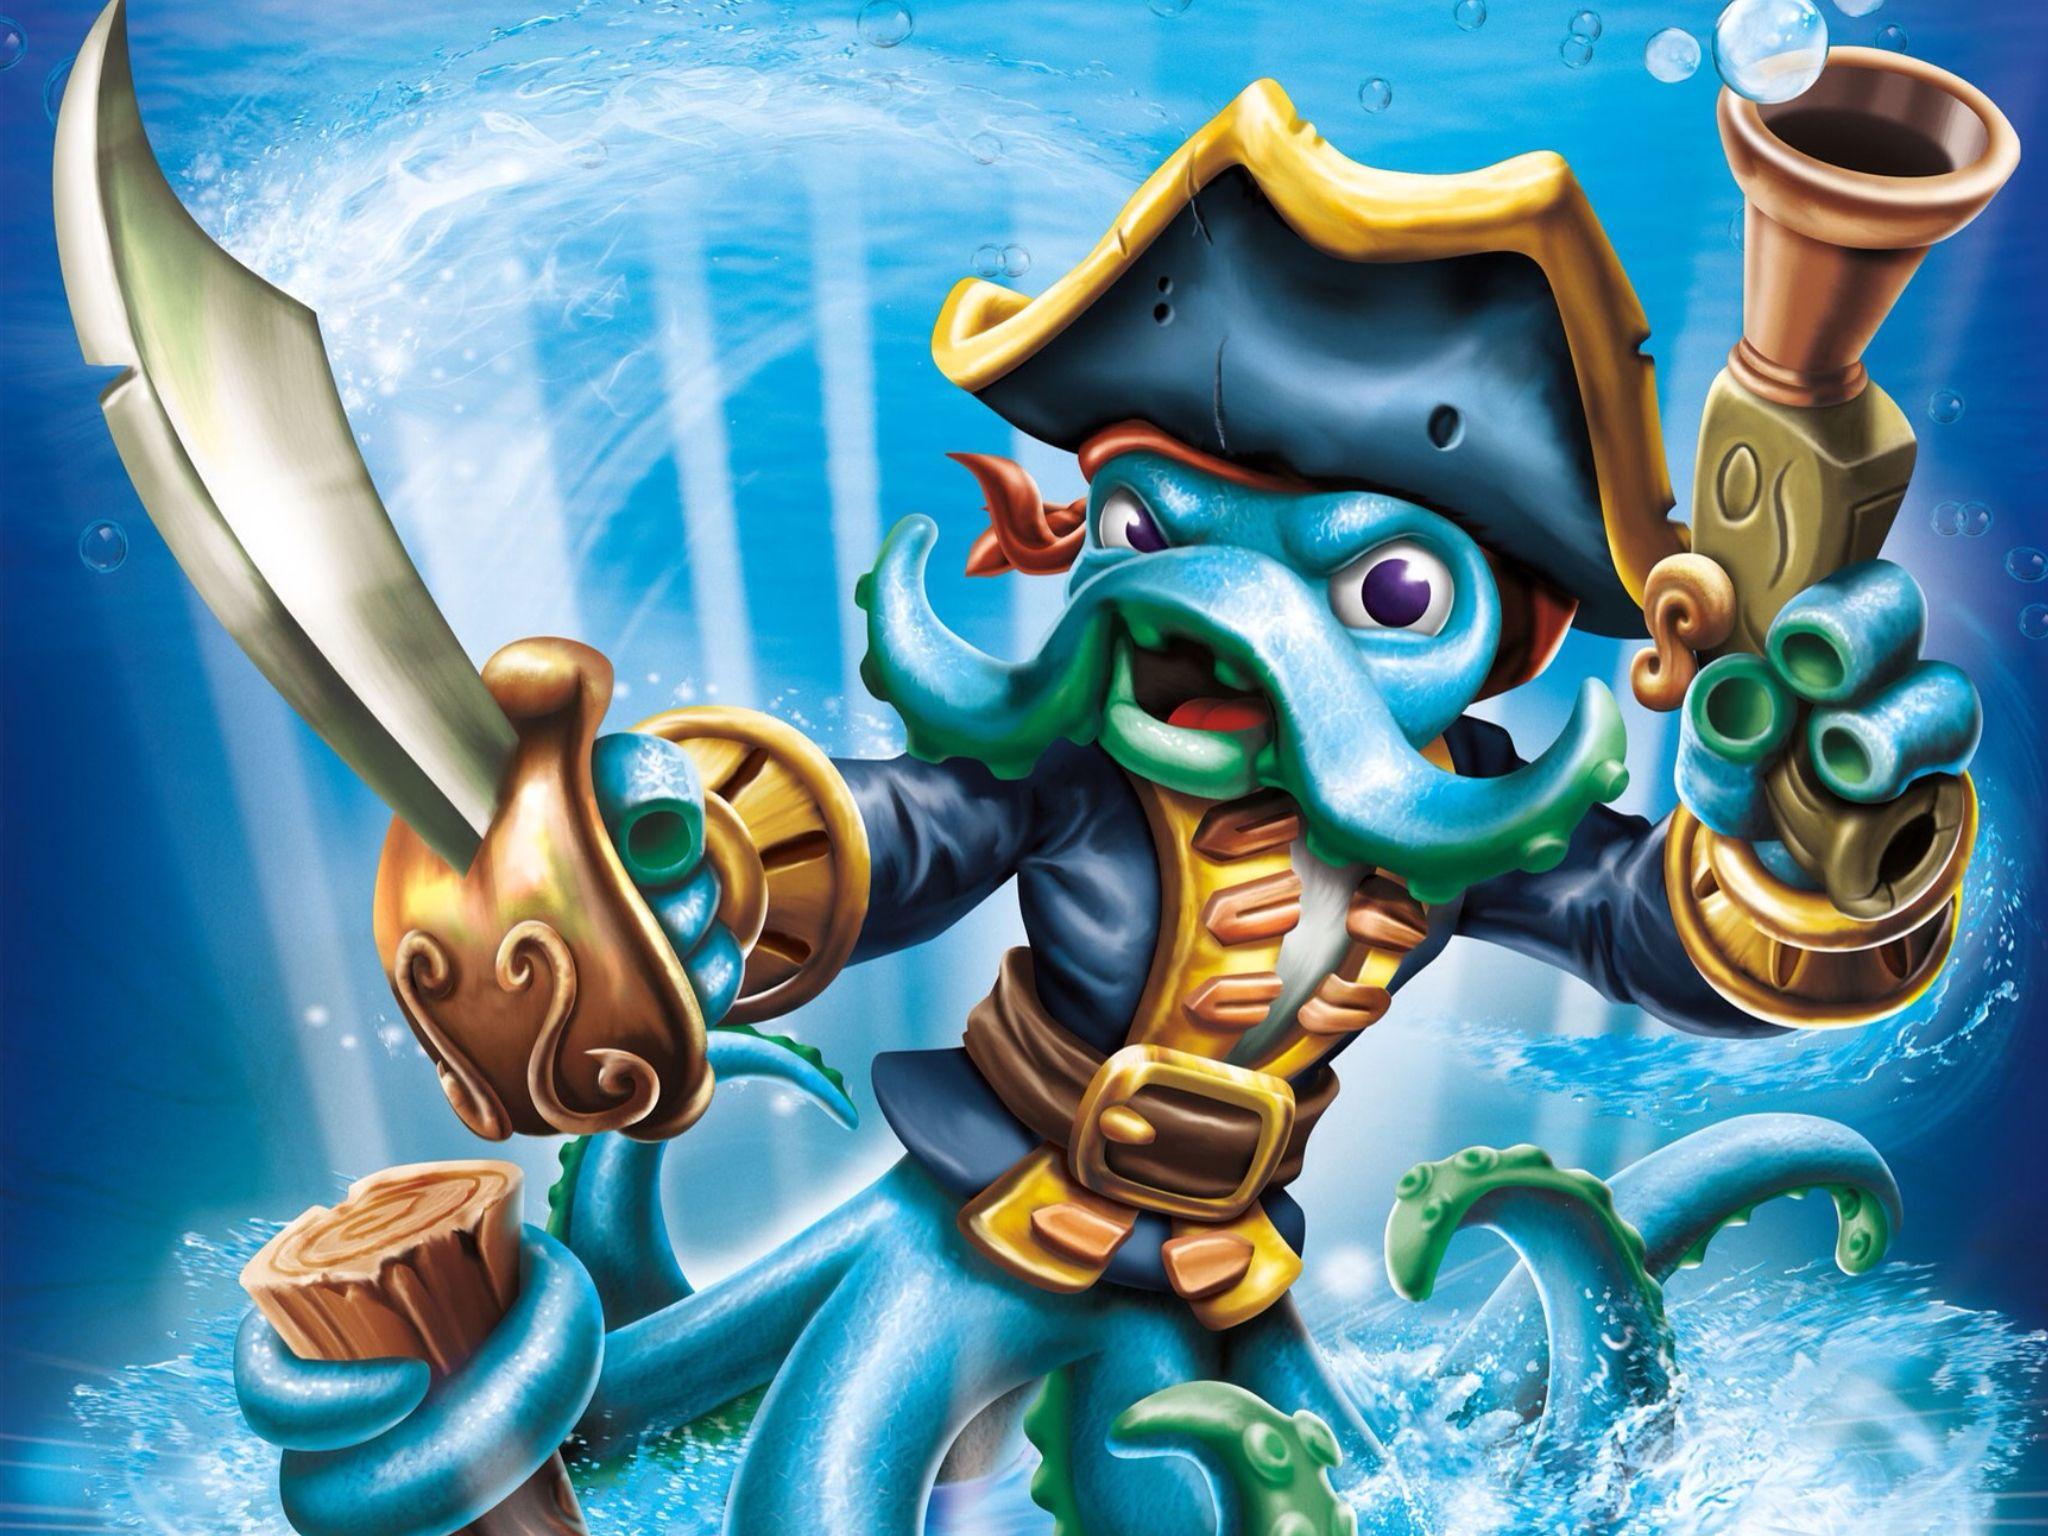 Skylanders Swap Force Kleurplaten Leuk Voor Kids Desenhos Animados Antigos Personagens Desenhos Animados